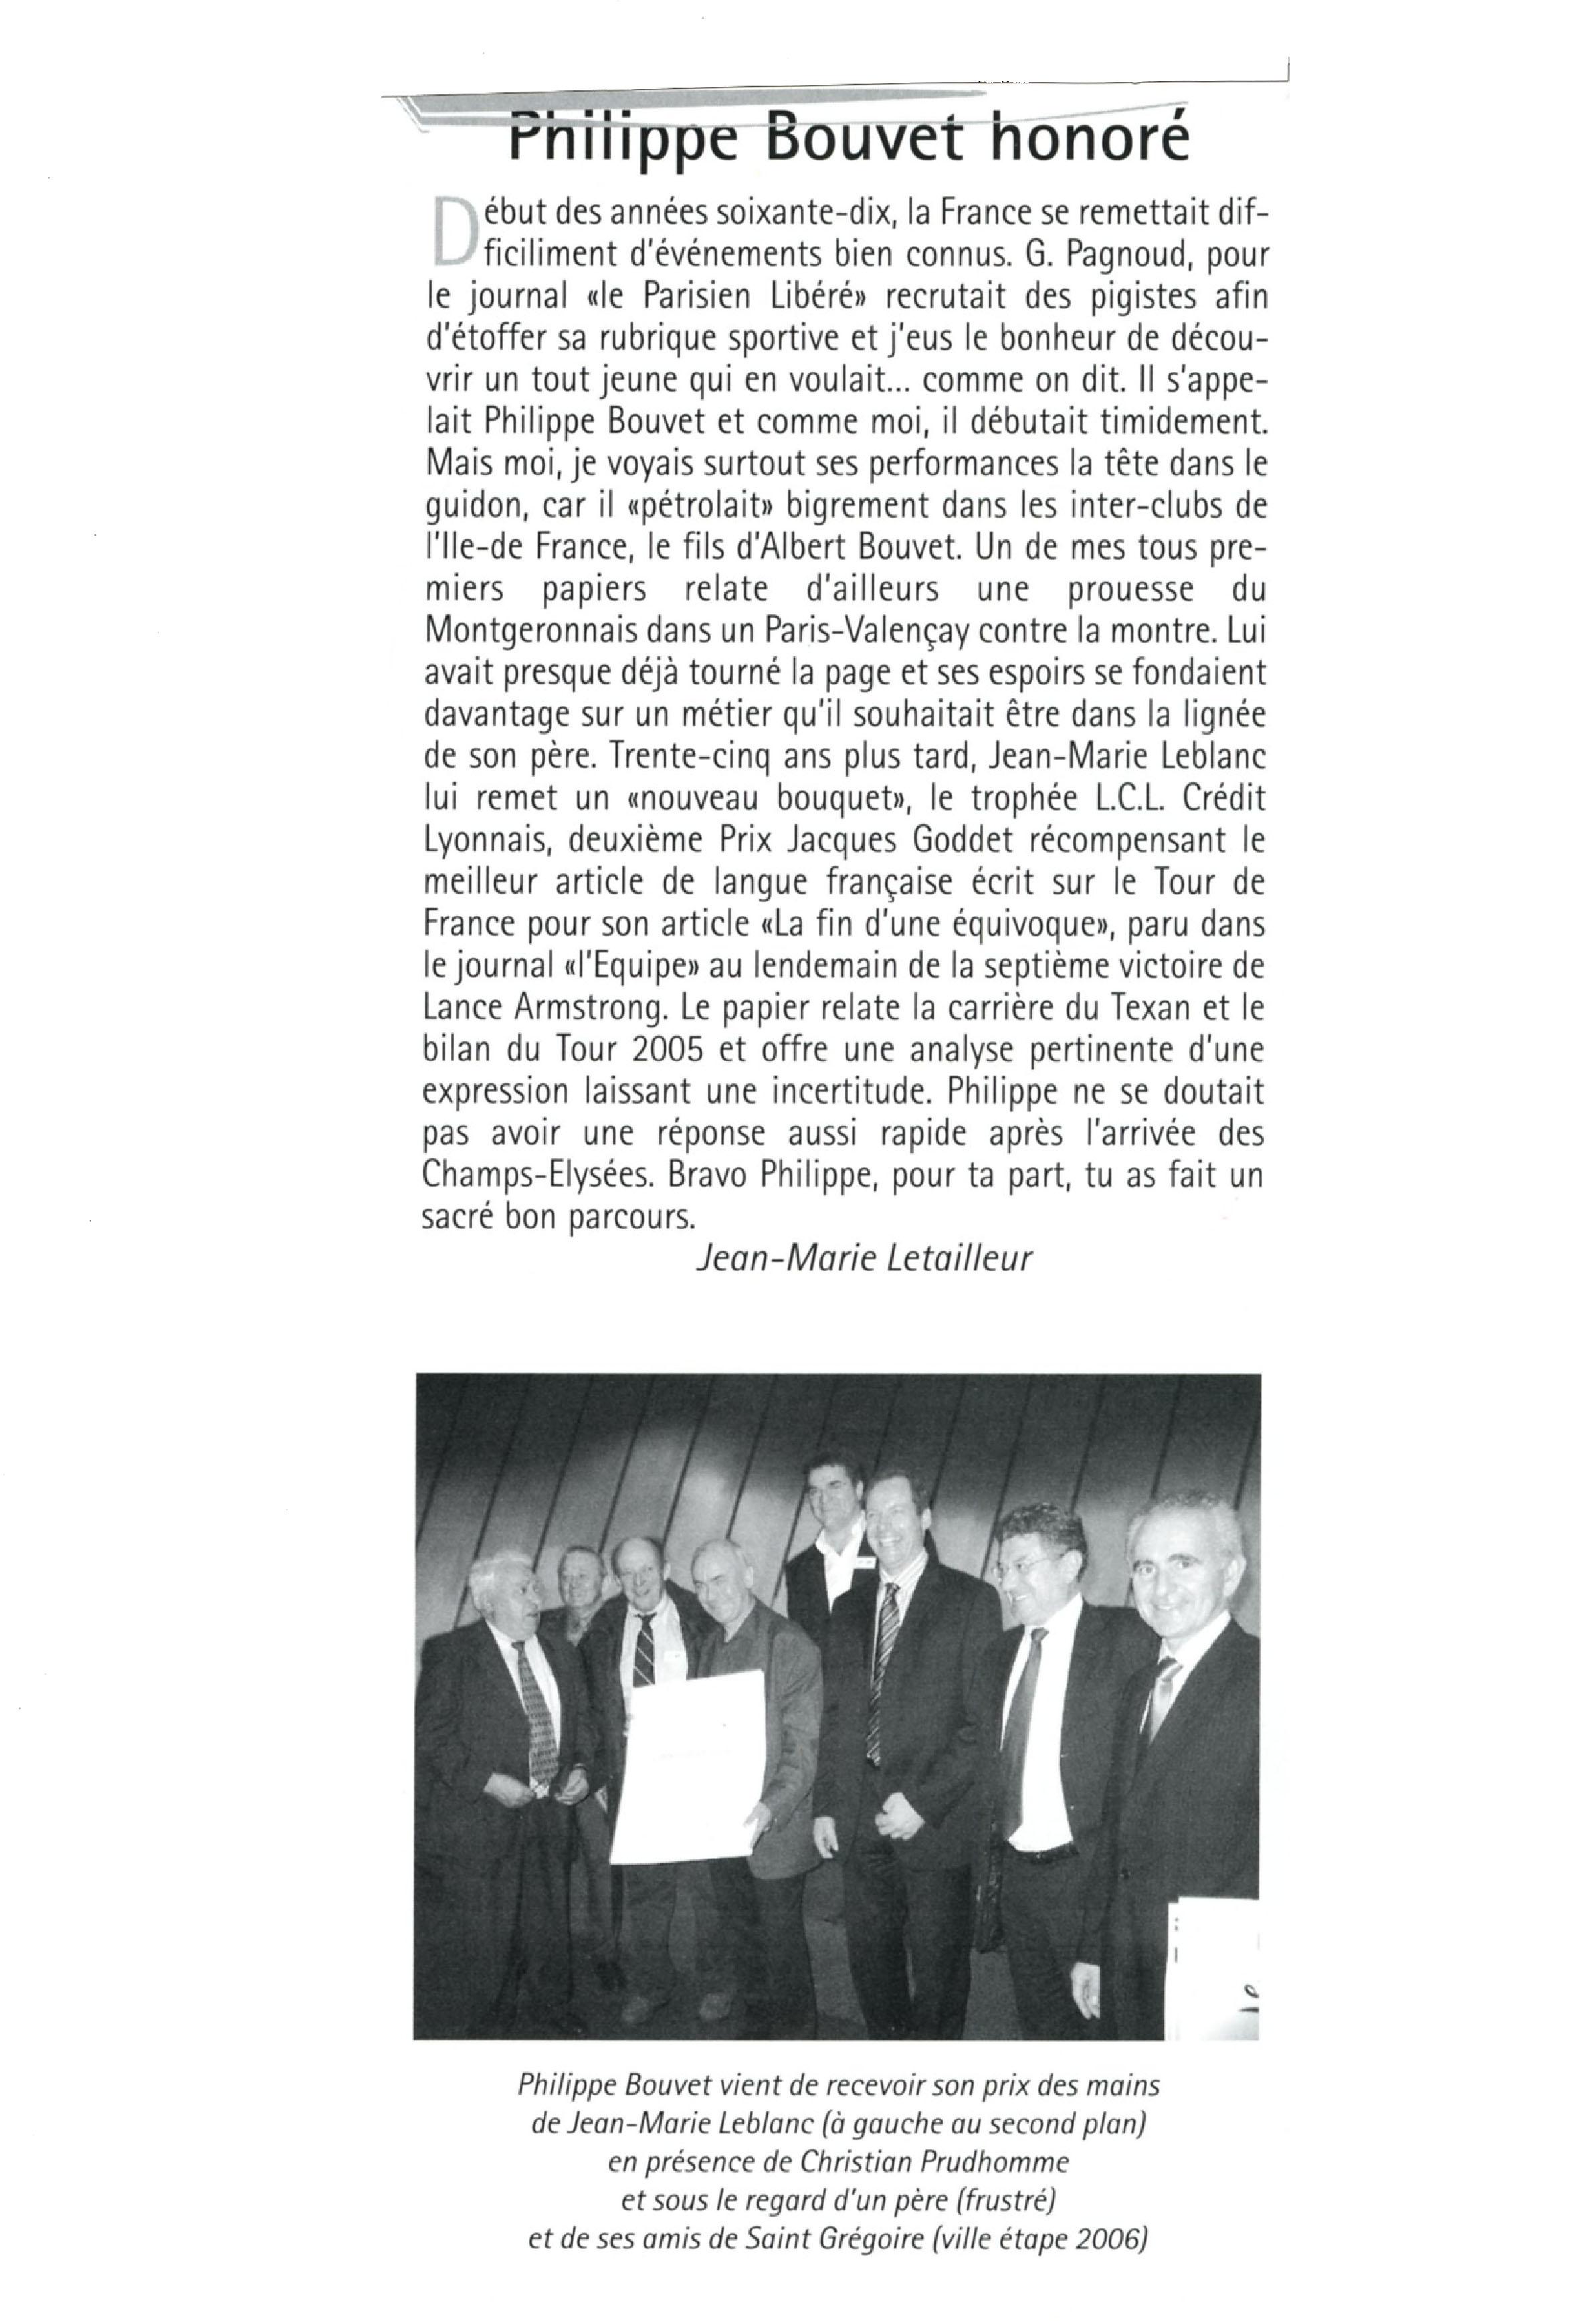 Presse - VeloStar - Prix Jacques-Goddet - octobre 2006